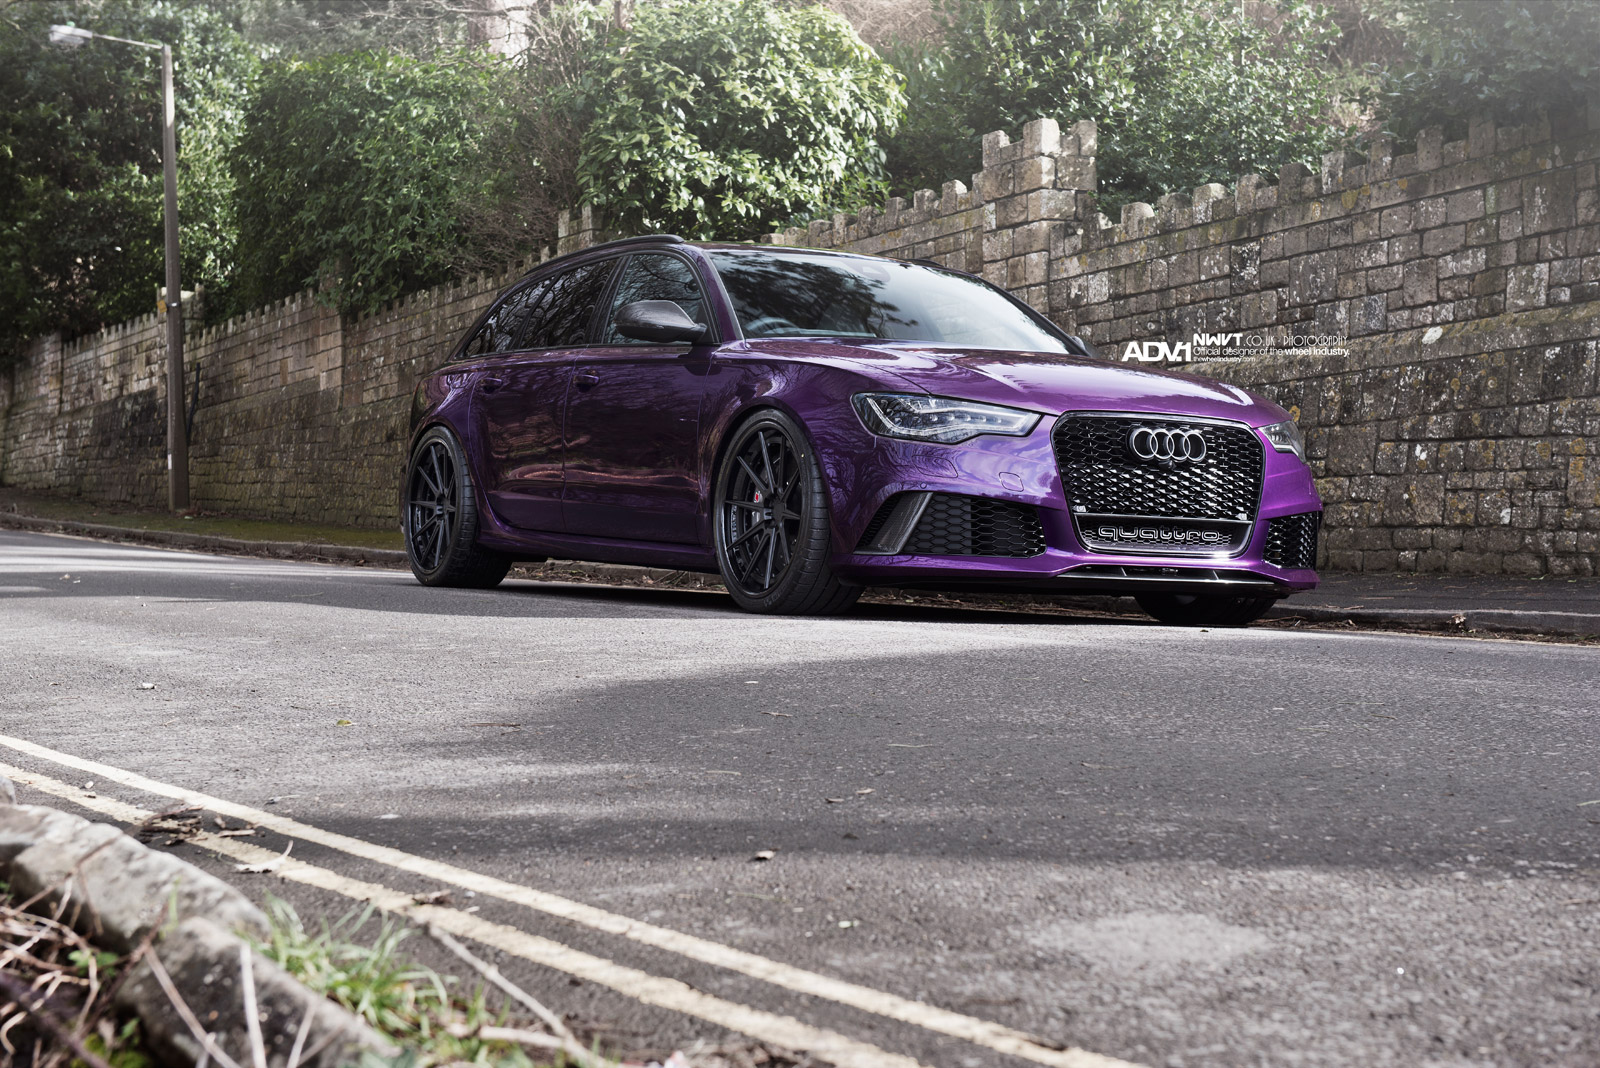 Audi A6 Wallpaper Hd Purple Sled Audi Rs6 Avant On Adv 1 Wheels Autoevolution